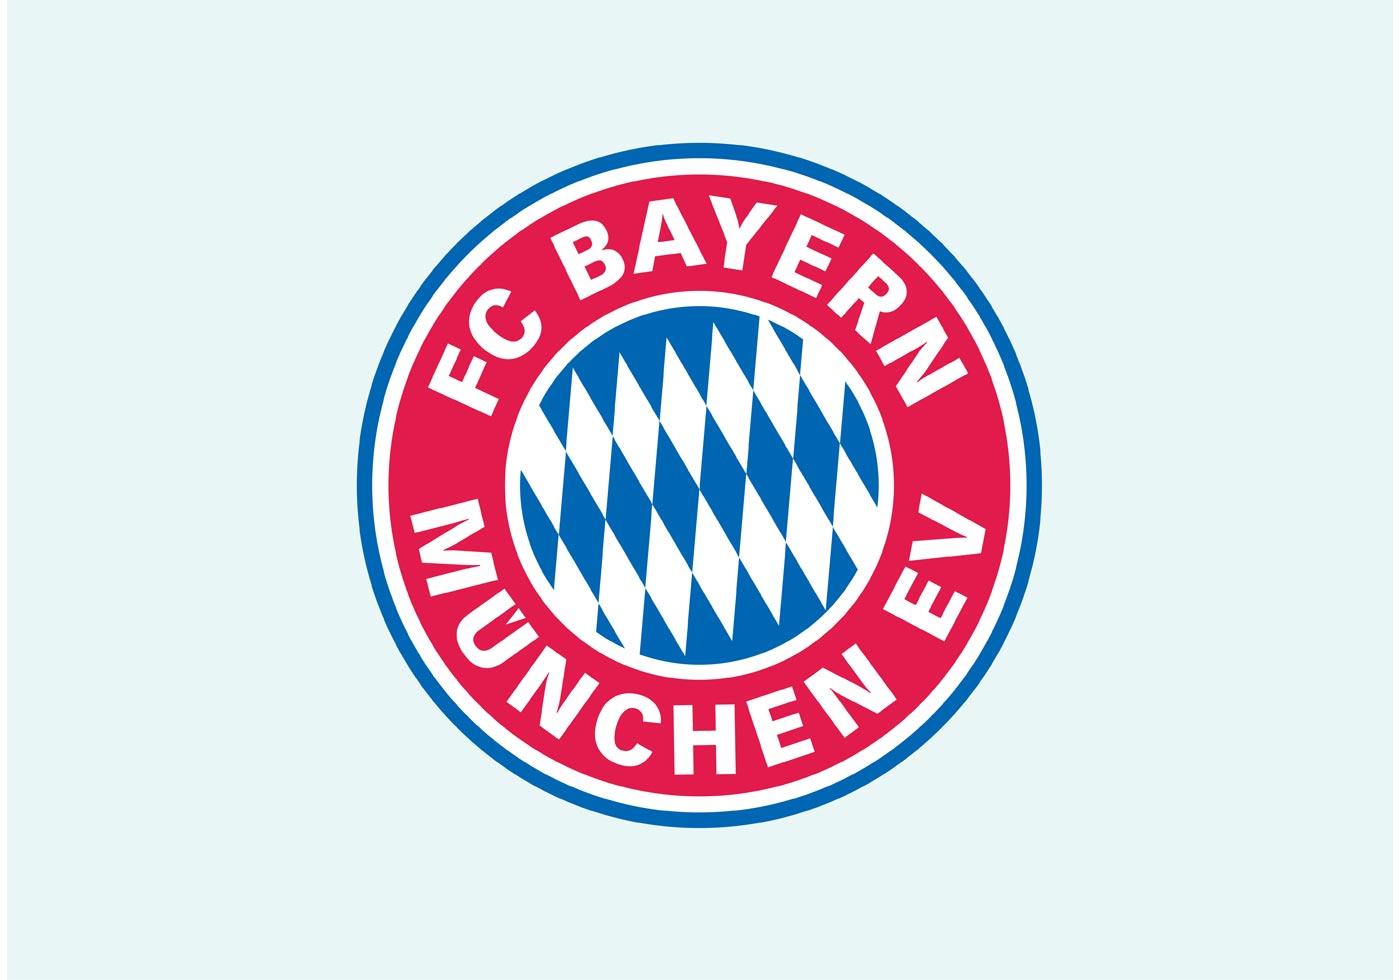 fc bayern emblem download kostenlos